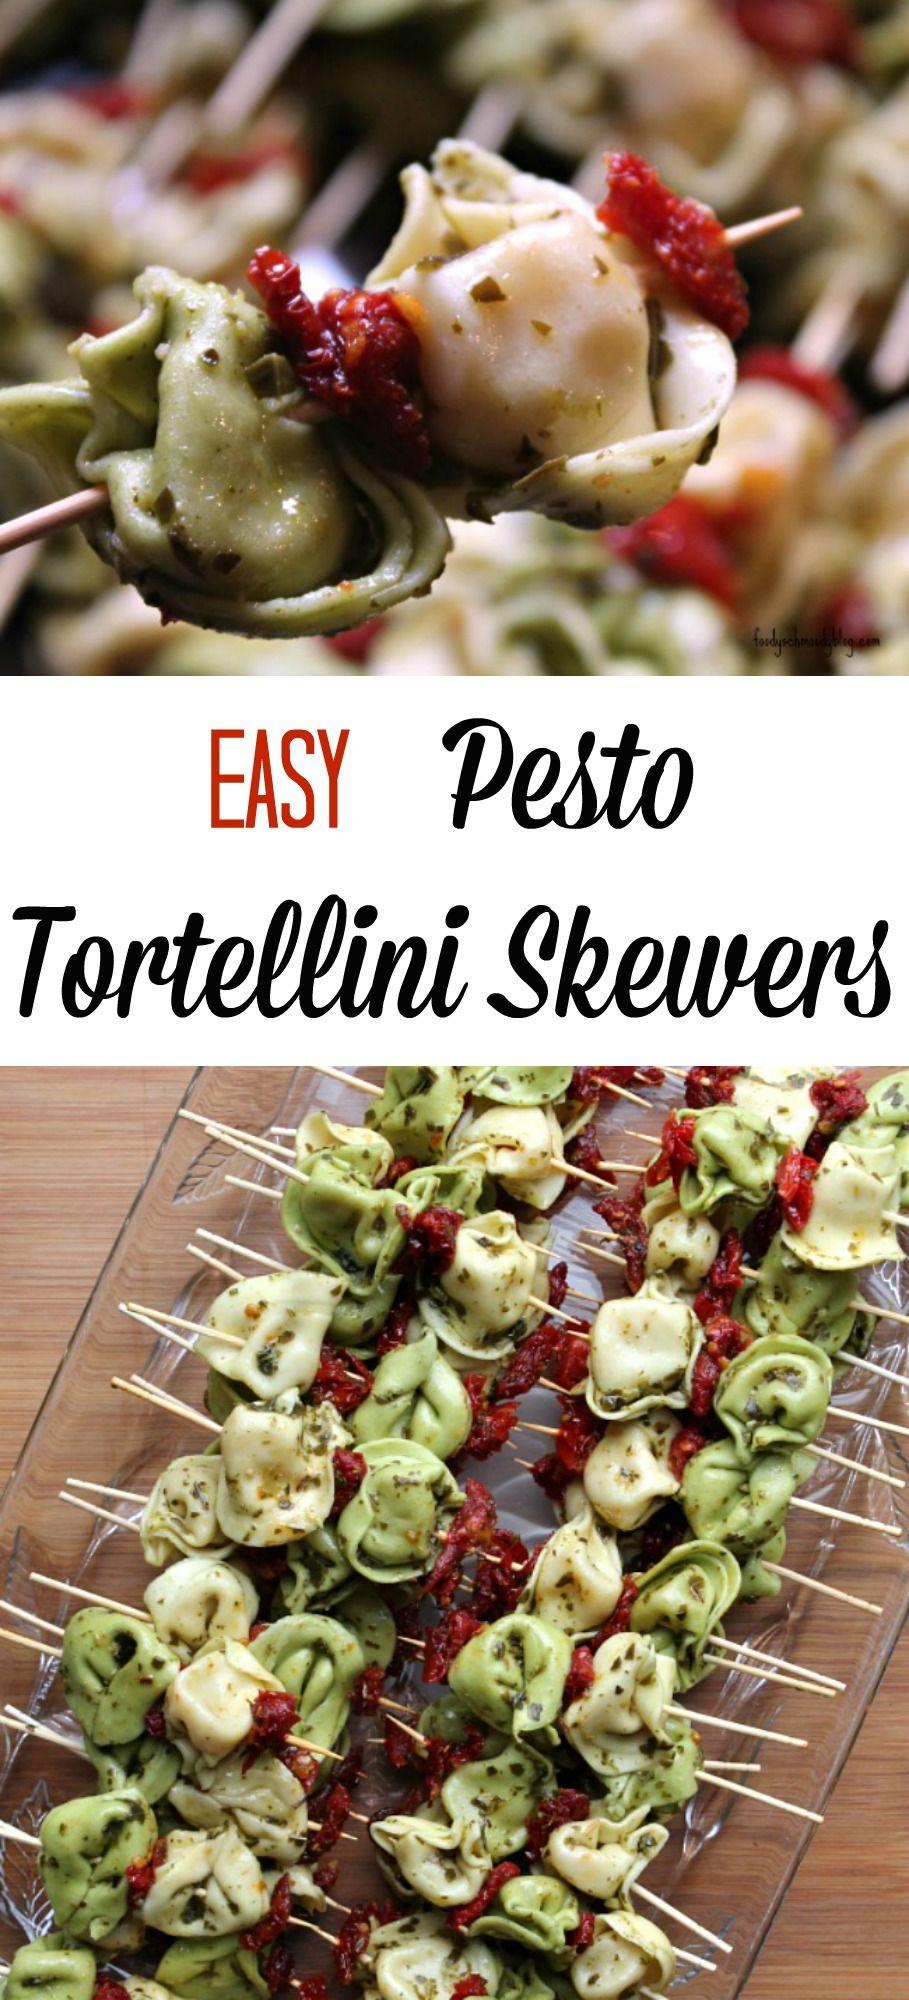 Easy Pesto Tortellini Skewers Recipe With Images Appetizer Recipes Friendsgiving Recipes Appetizers Pesto Tortellini